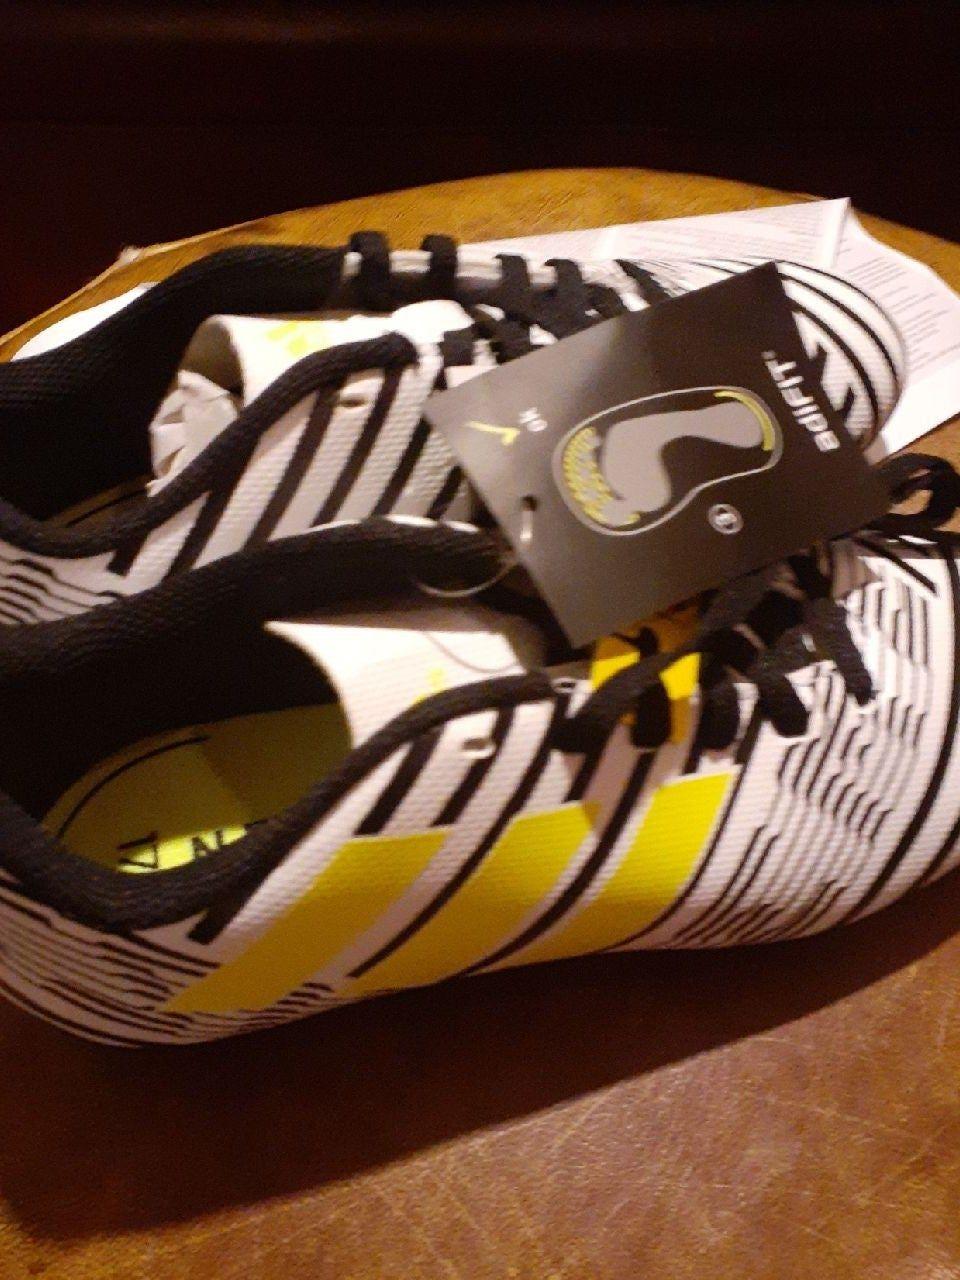 Nemeziz 174 fxg soccer us 1 12 adidas shoes adidas shoes